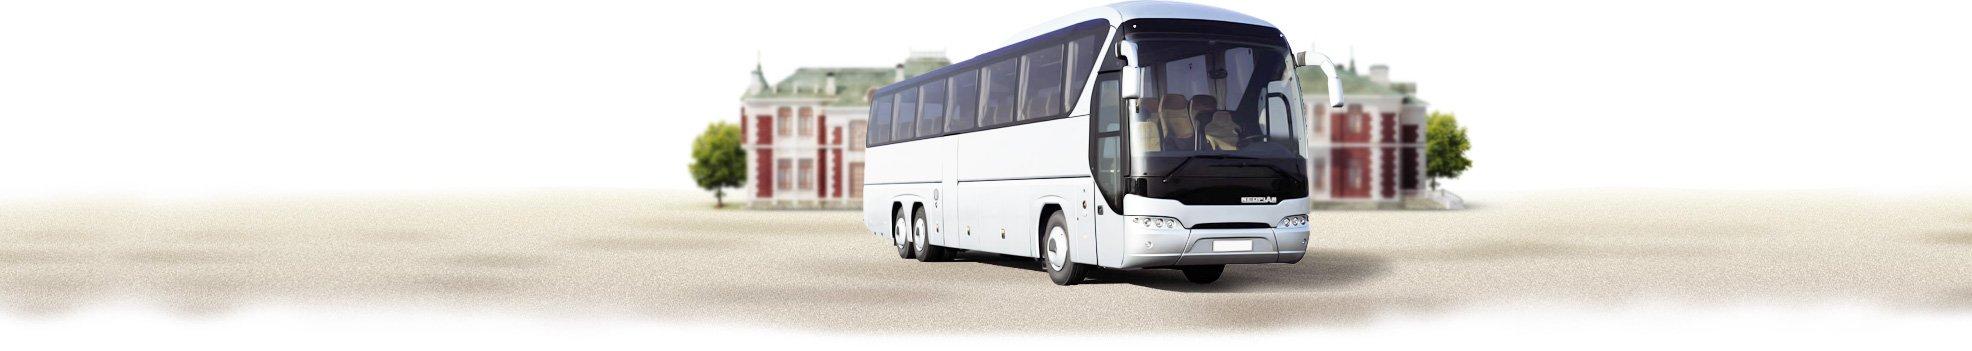 Оренда автобусу в Києві